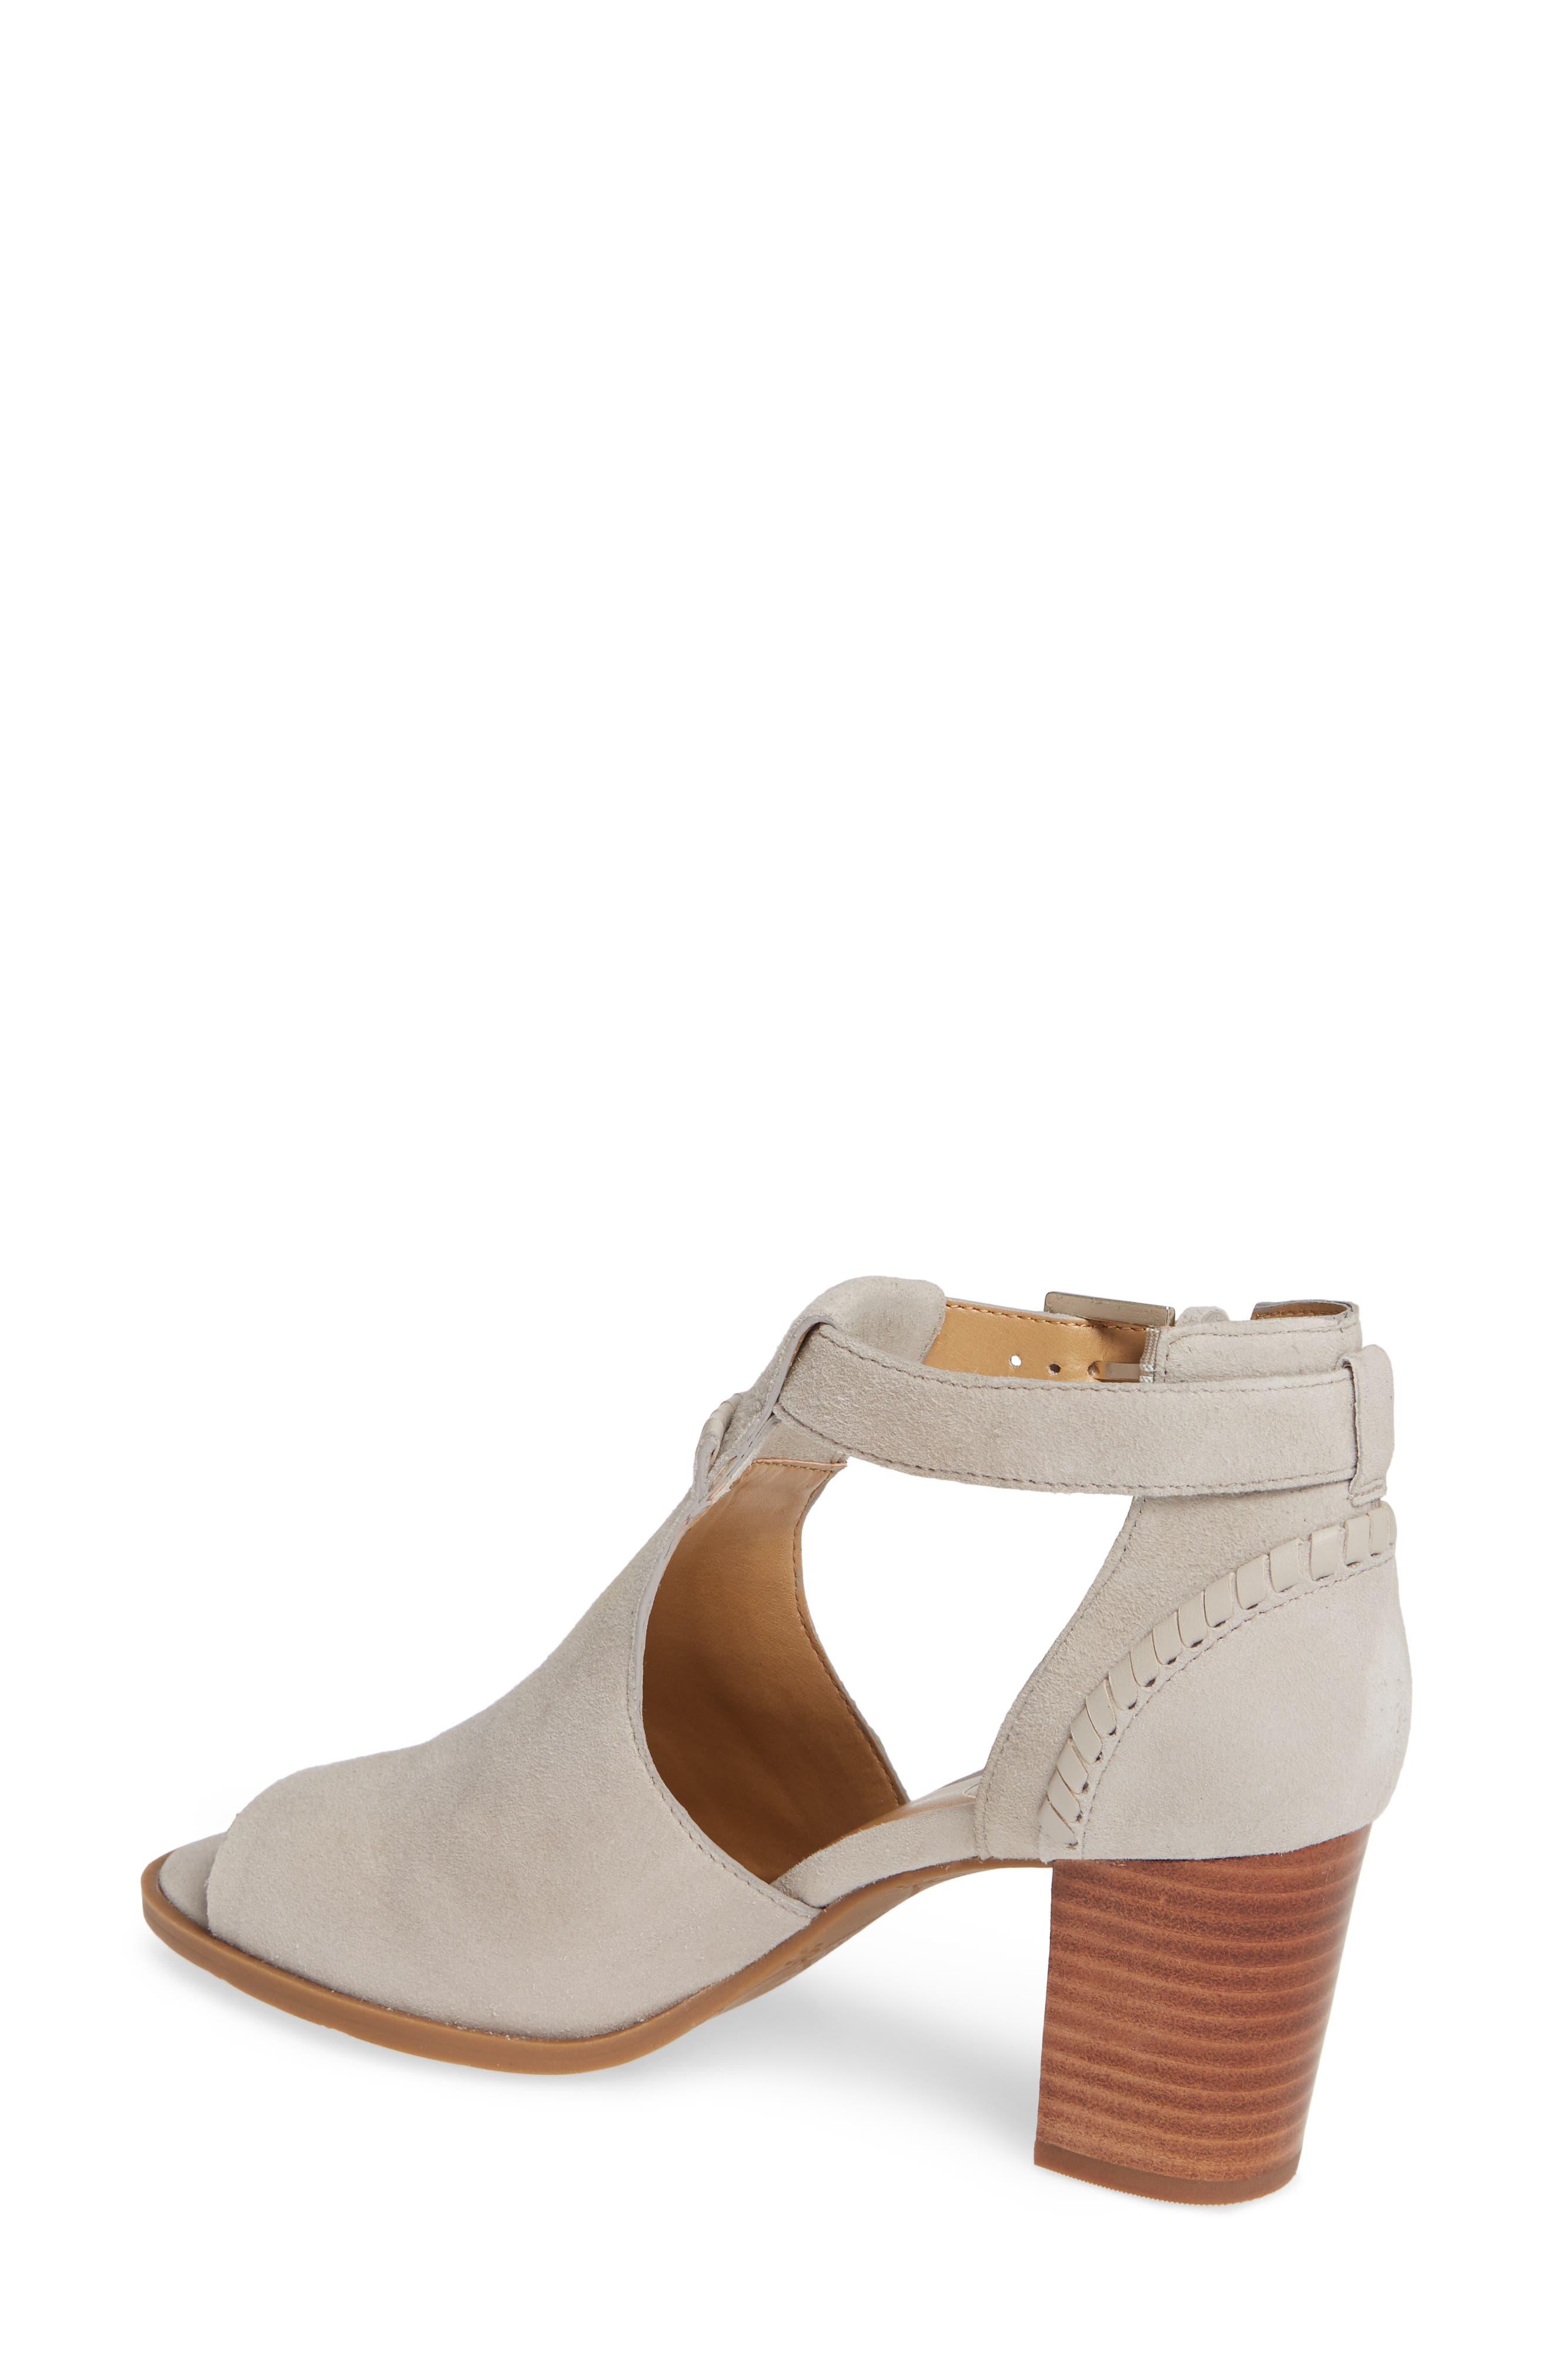 Cameron Block Heel Sandal,                             Alternate thumbnail 8, color,